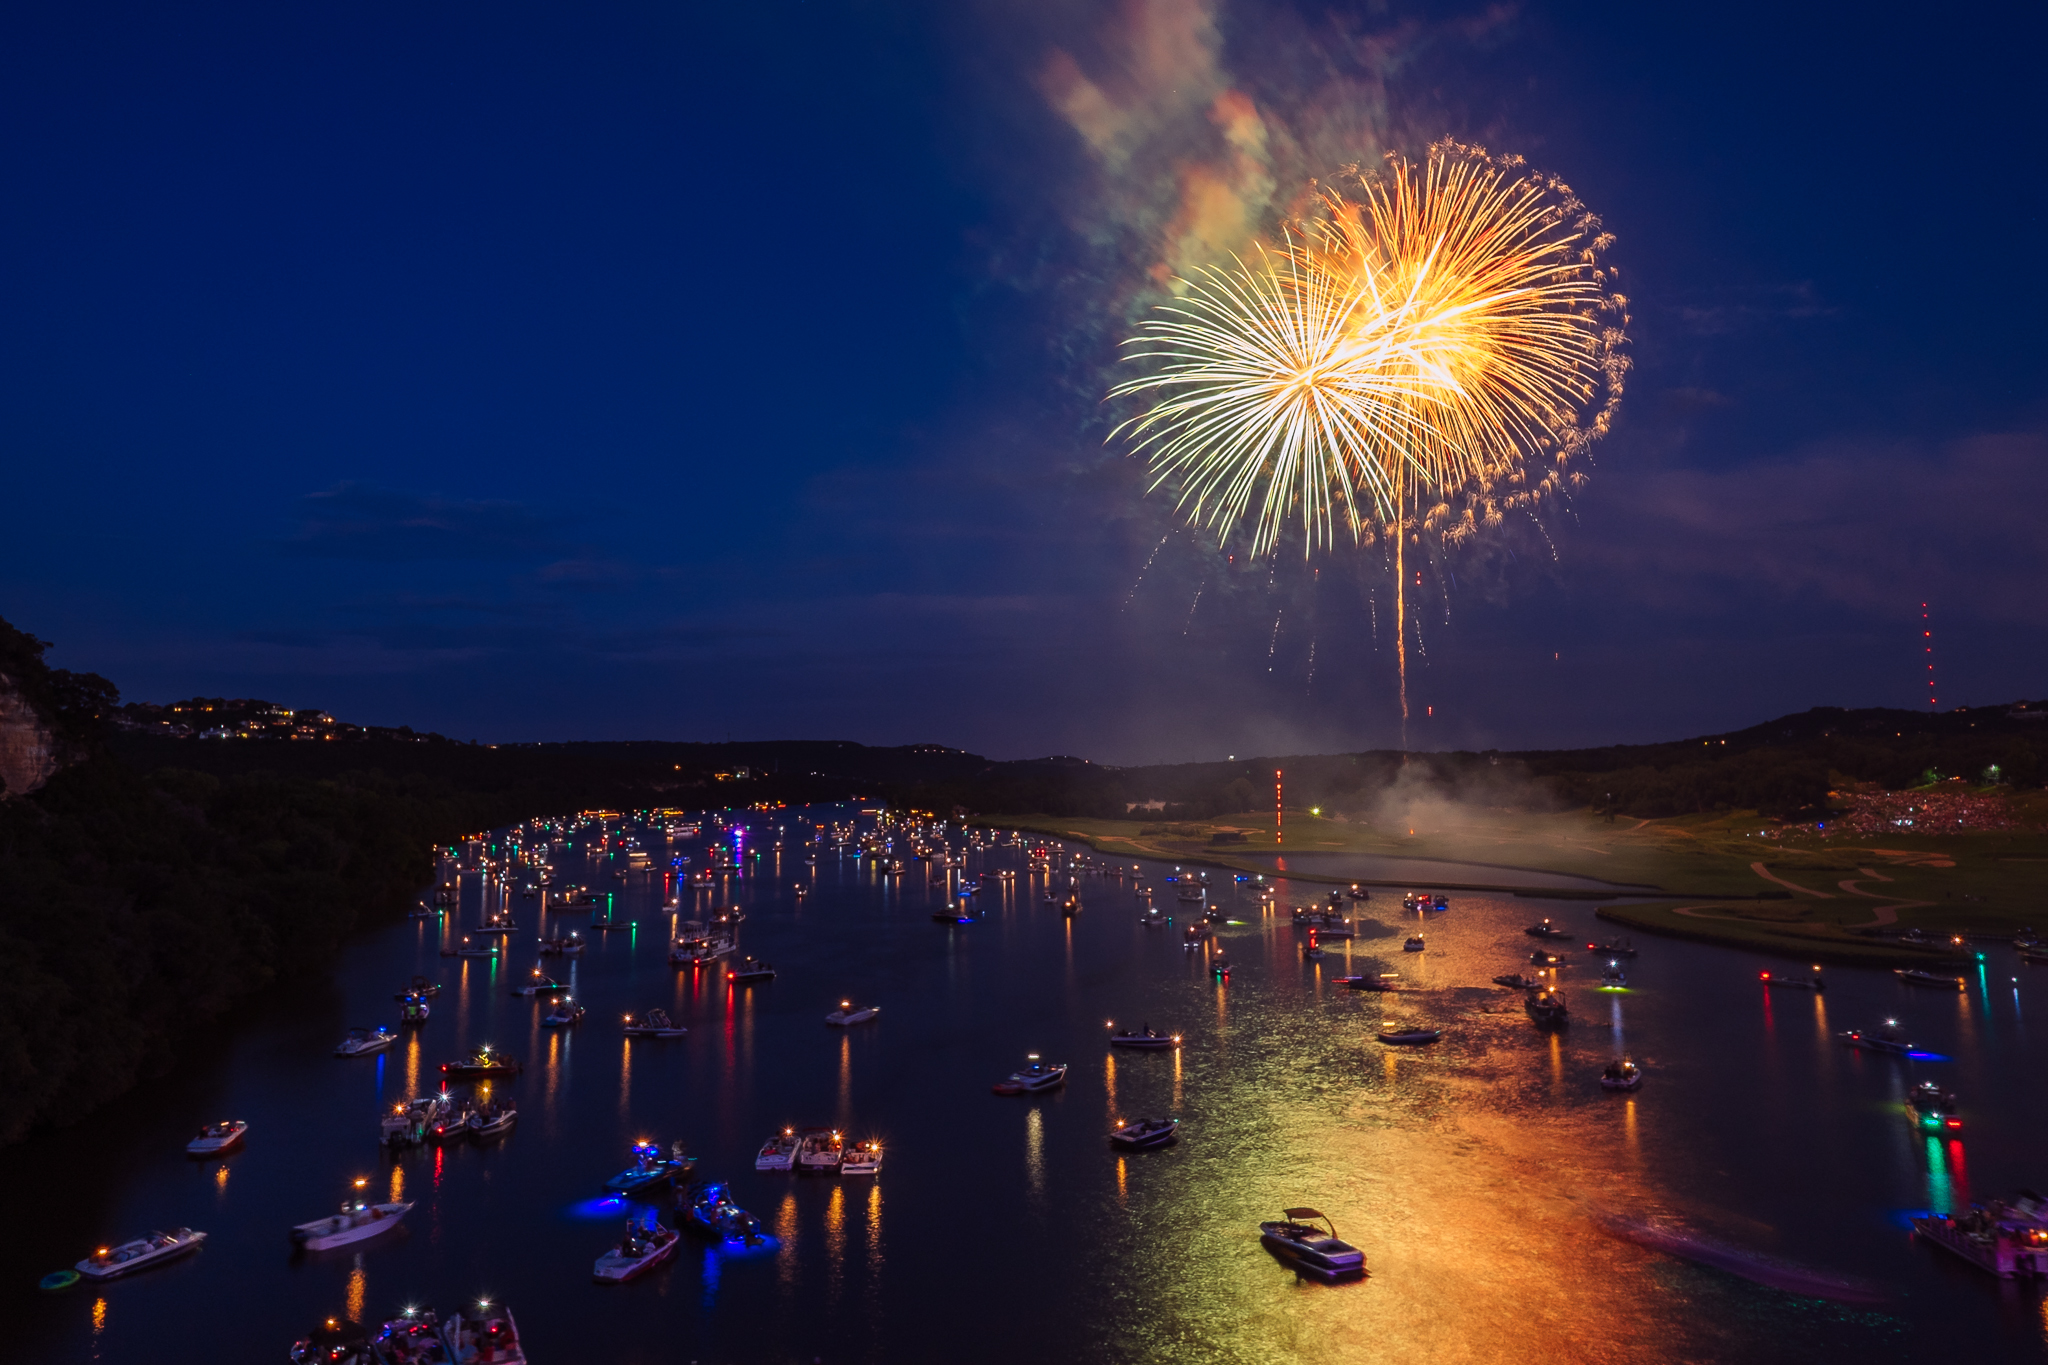 austin_fireworks_2014_1.jpg